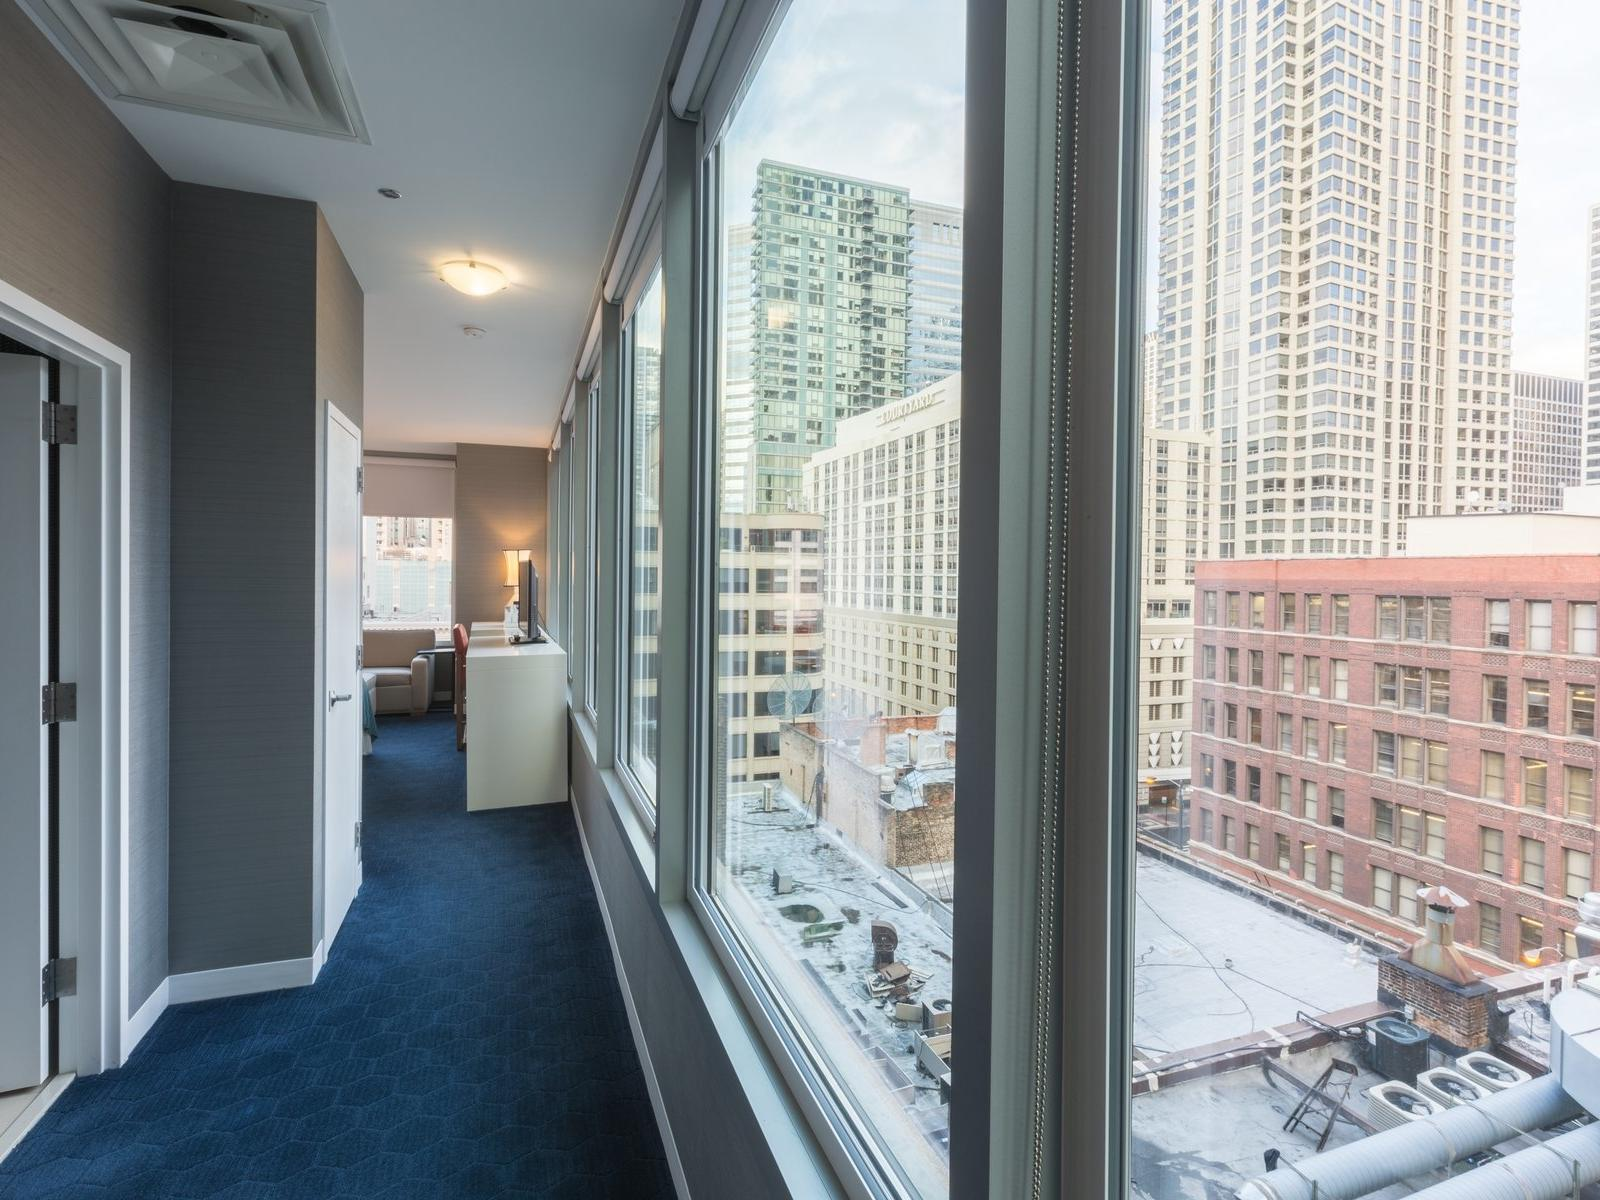 hallway with window overlooking city